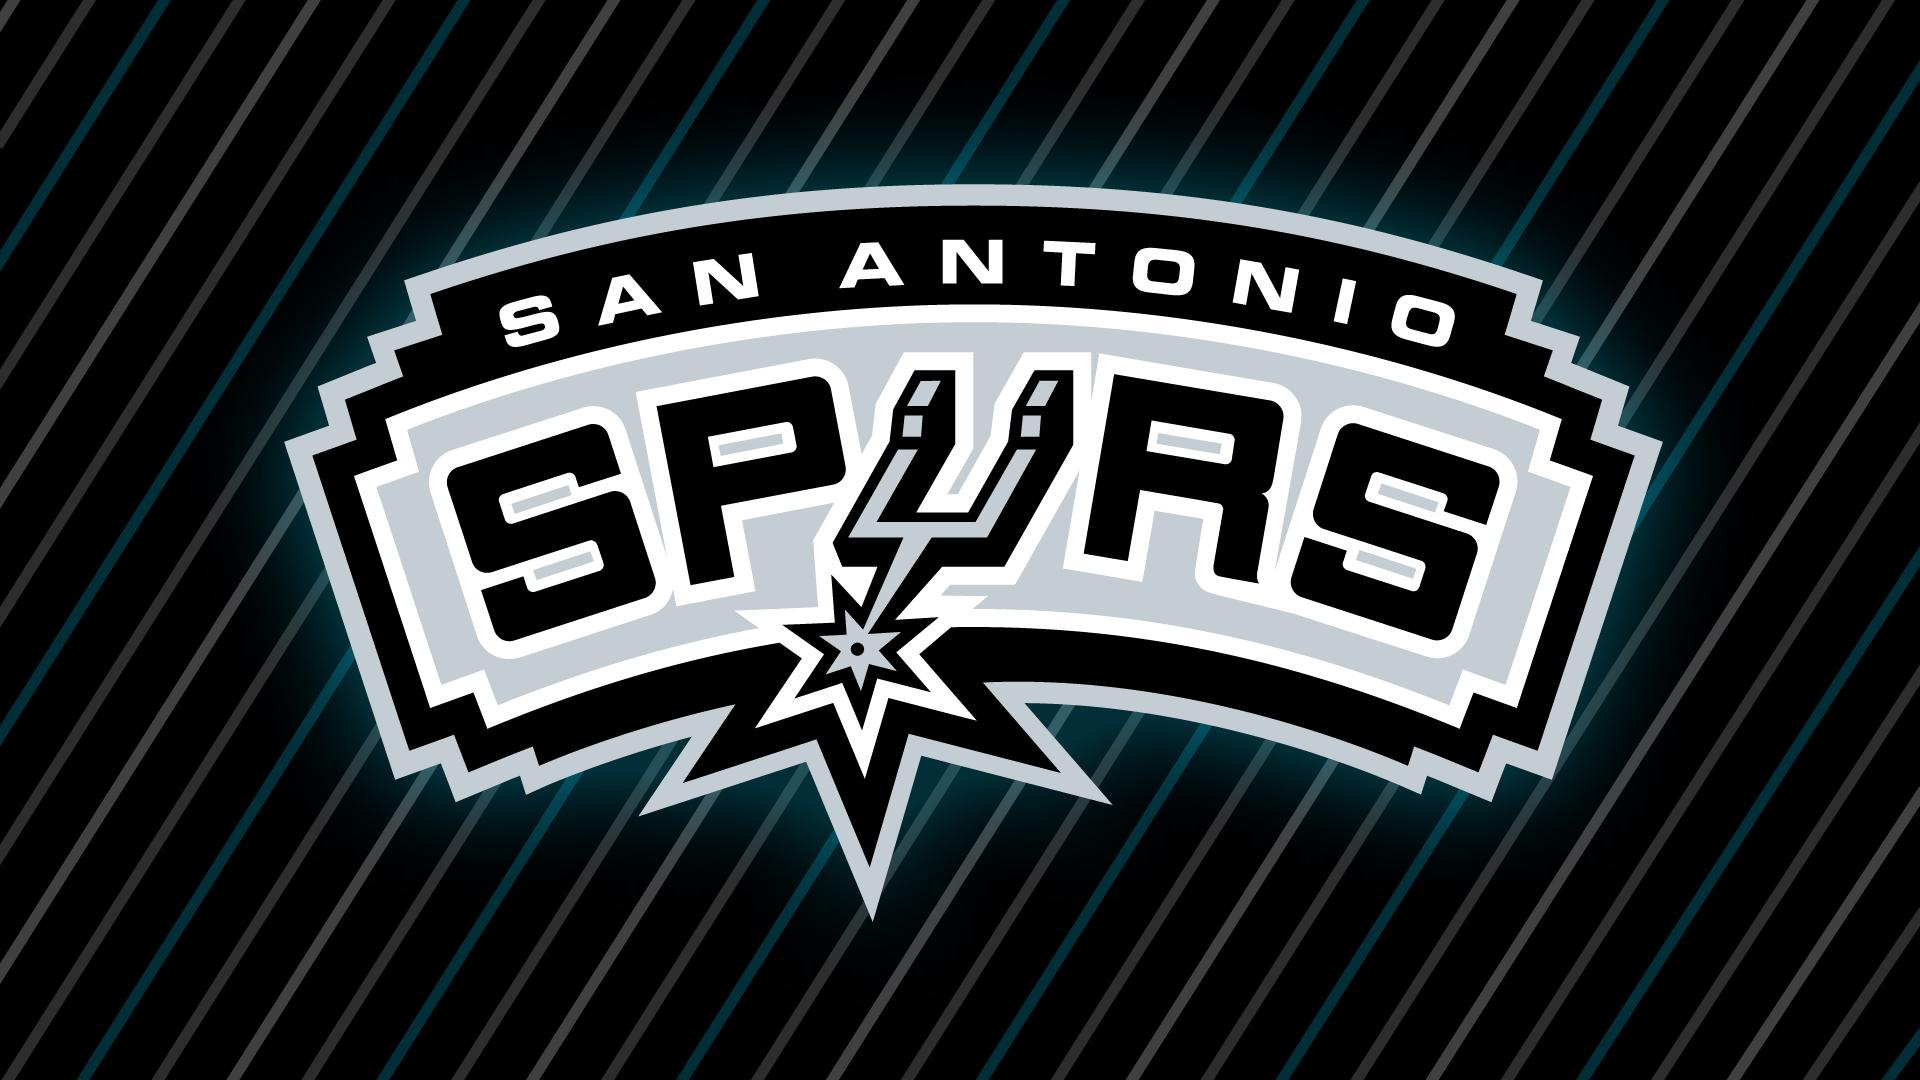 San Antonio Spurs Browser Themes Desktop Wallpapers More 1920x1080